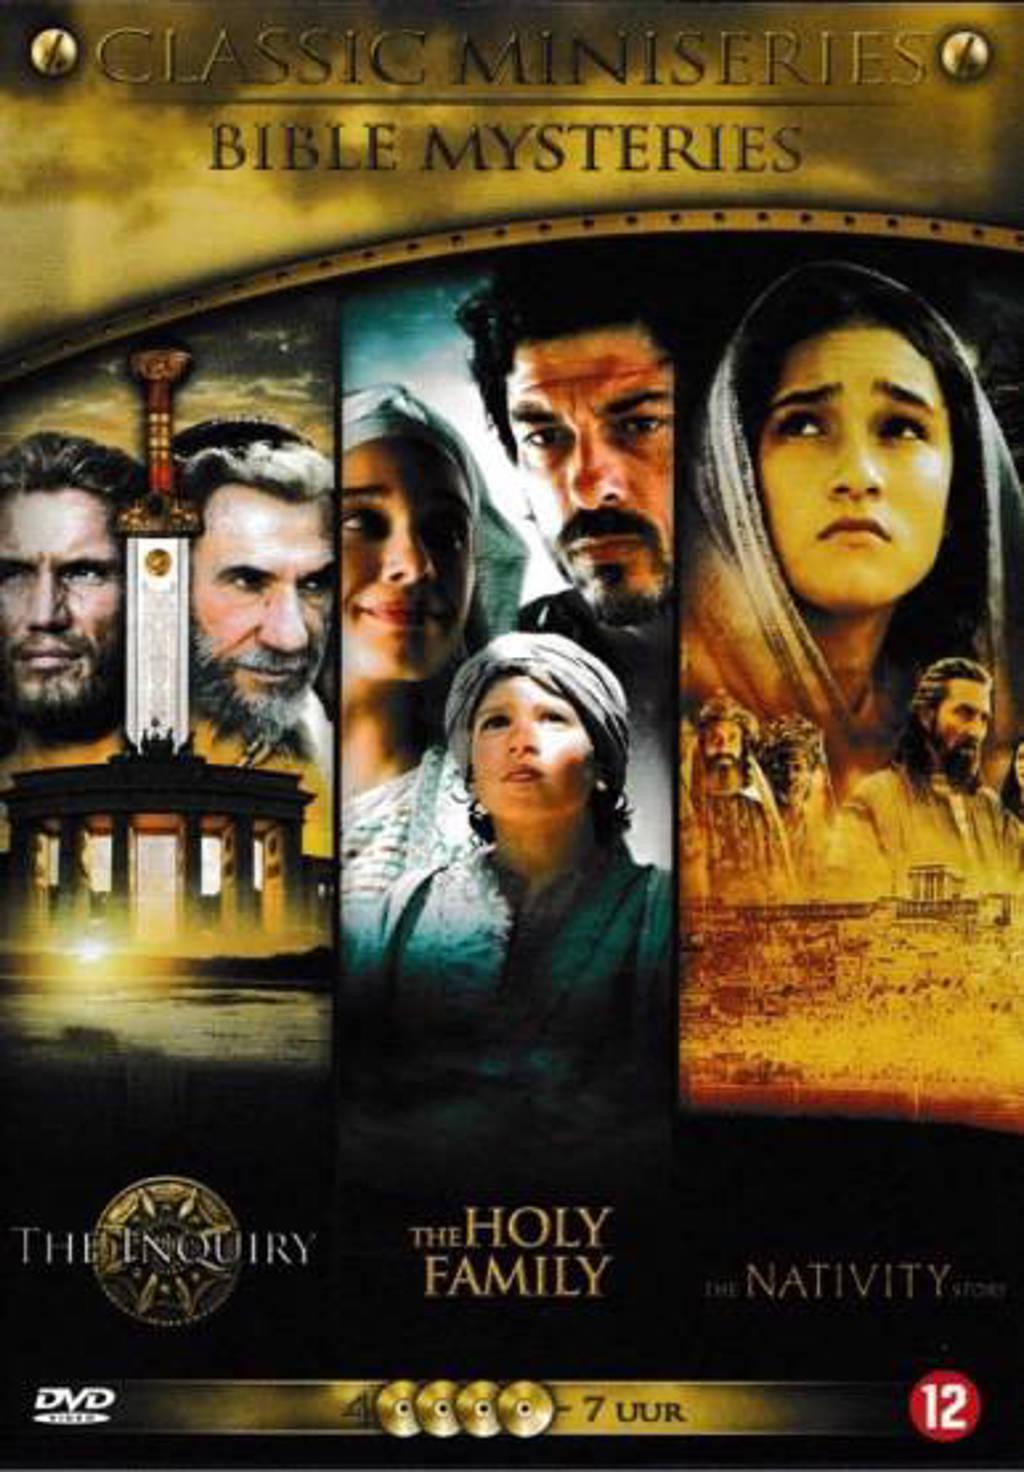 Bible mysteries box (DVD)